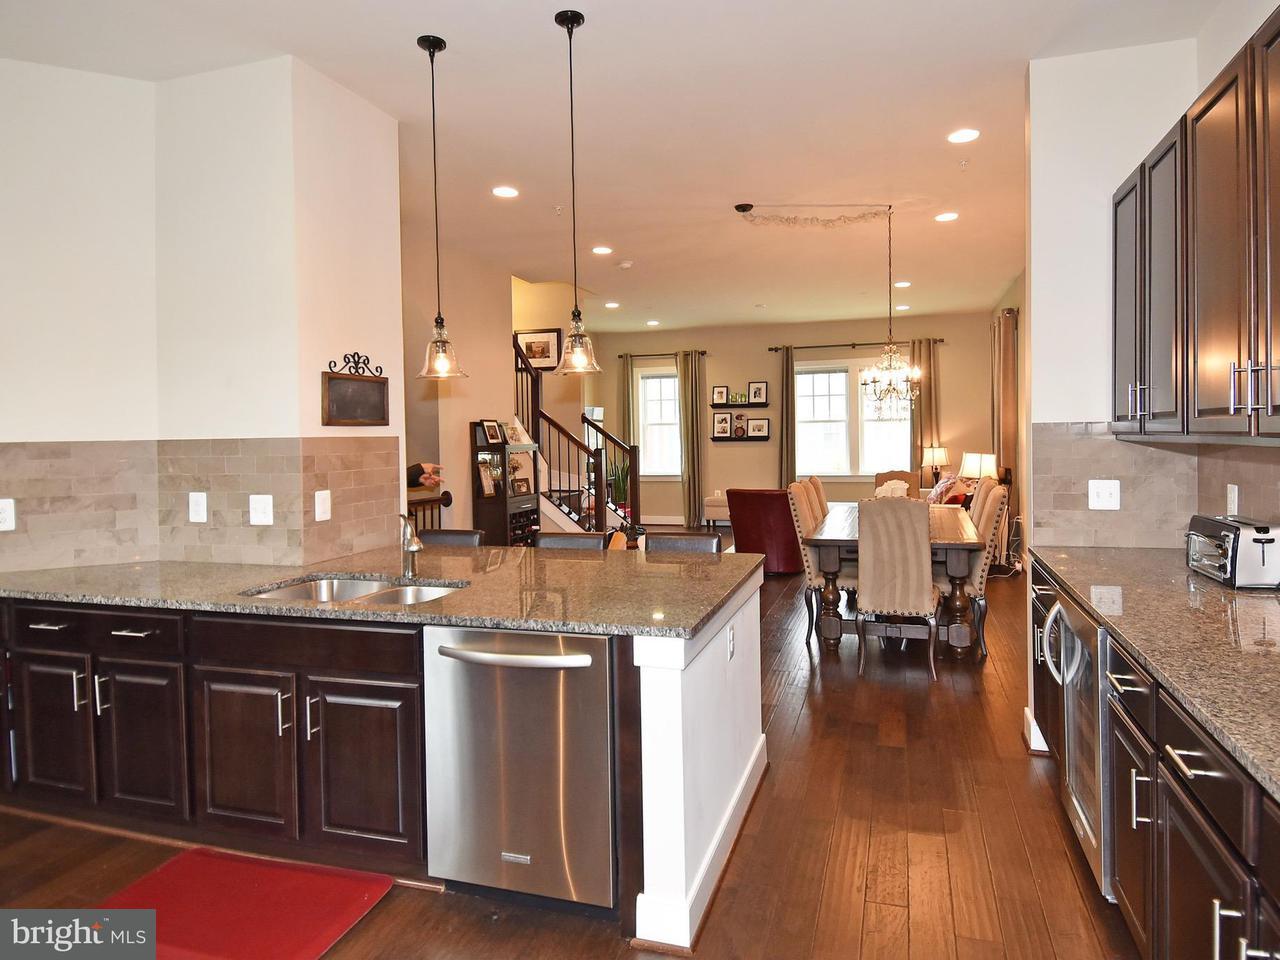 Townhouse for Sale at 720 DIAMOND Avenue 720 DIAMOND Avenue Alexandria, Virginia 22301 United States